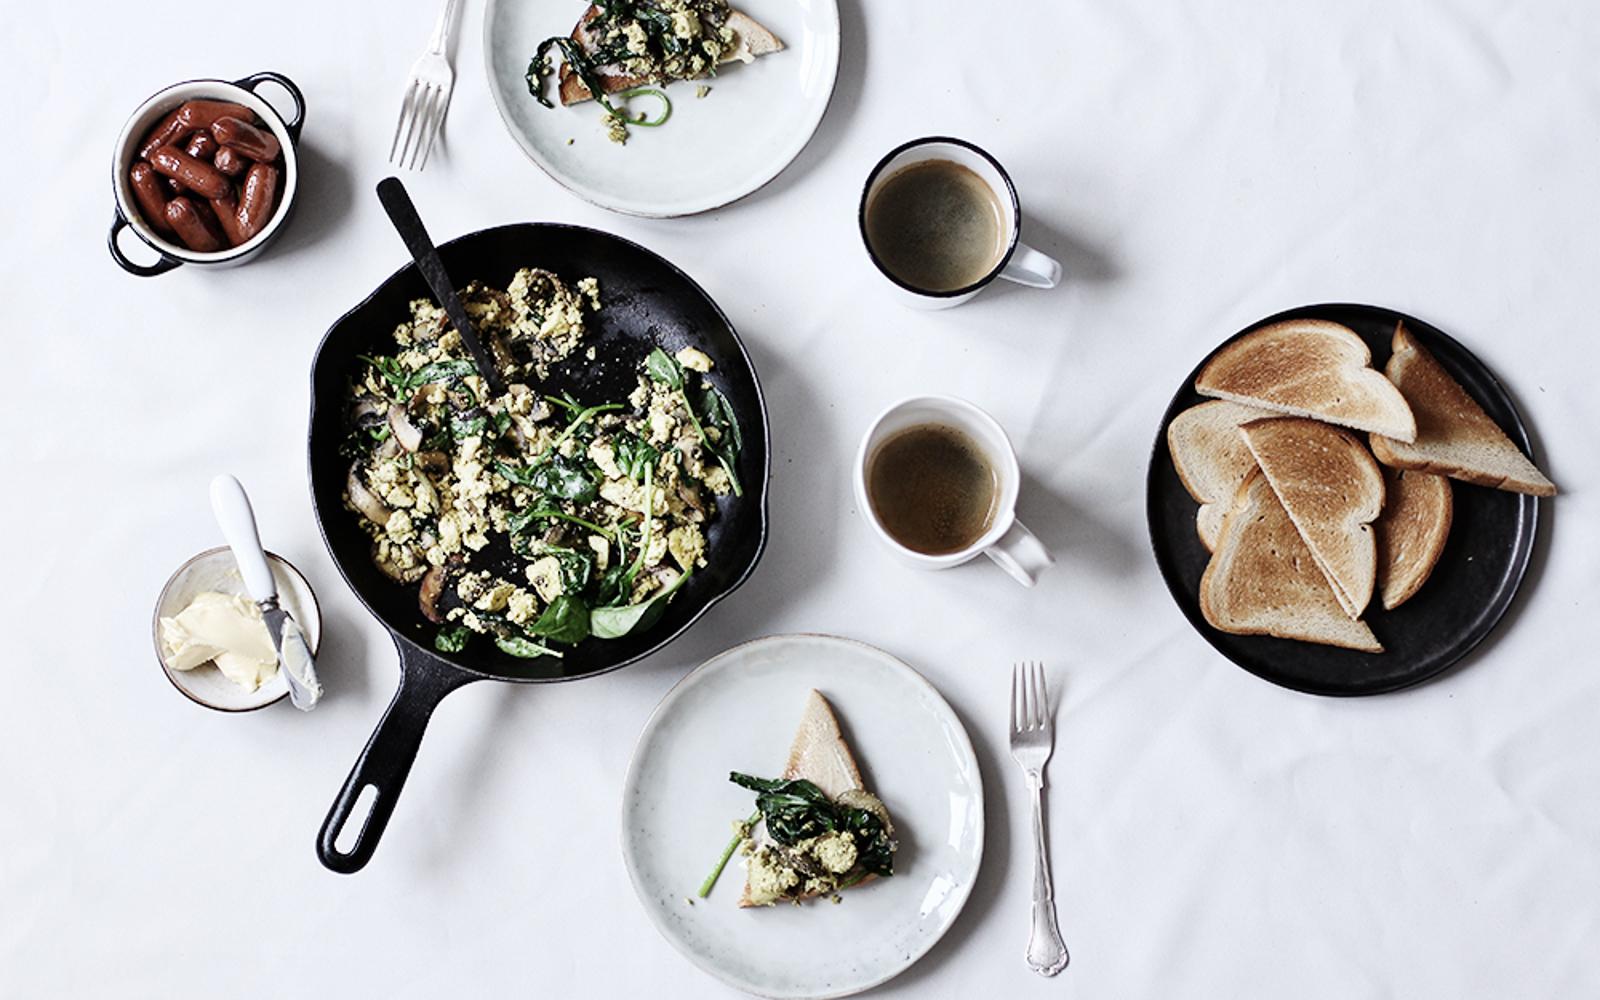 Wild Mushroom and Garlic Scramble